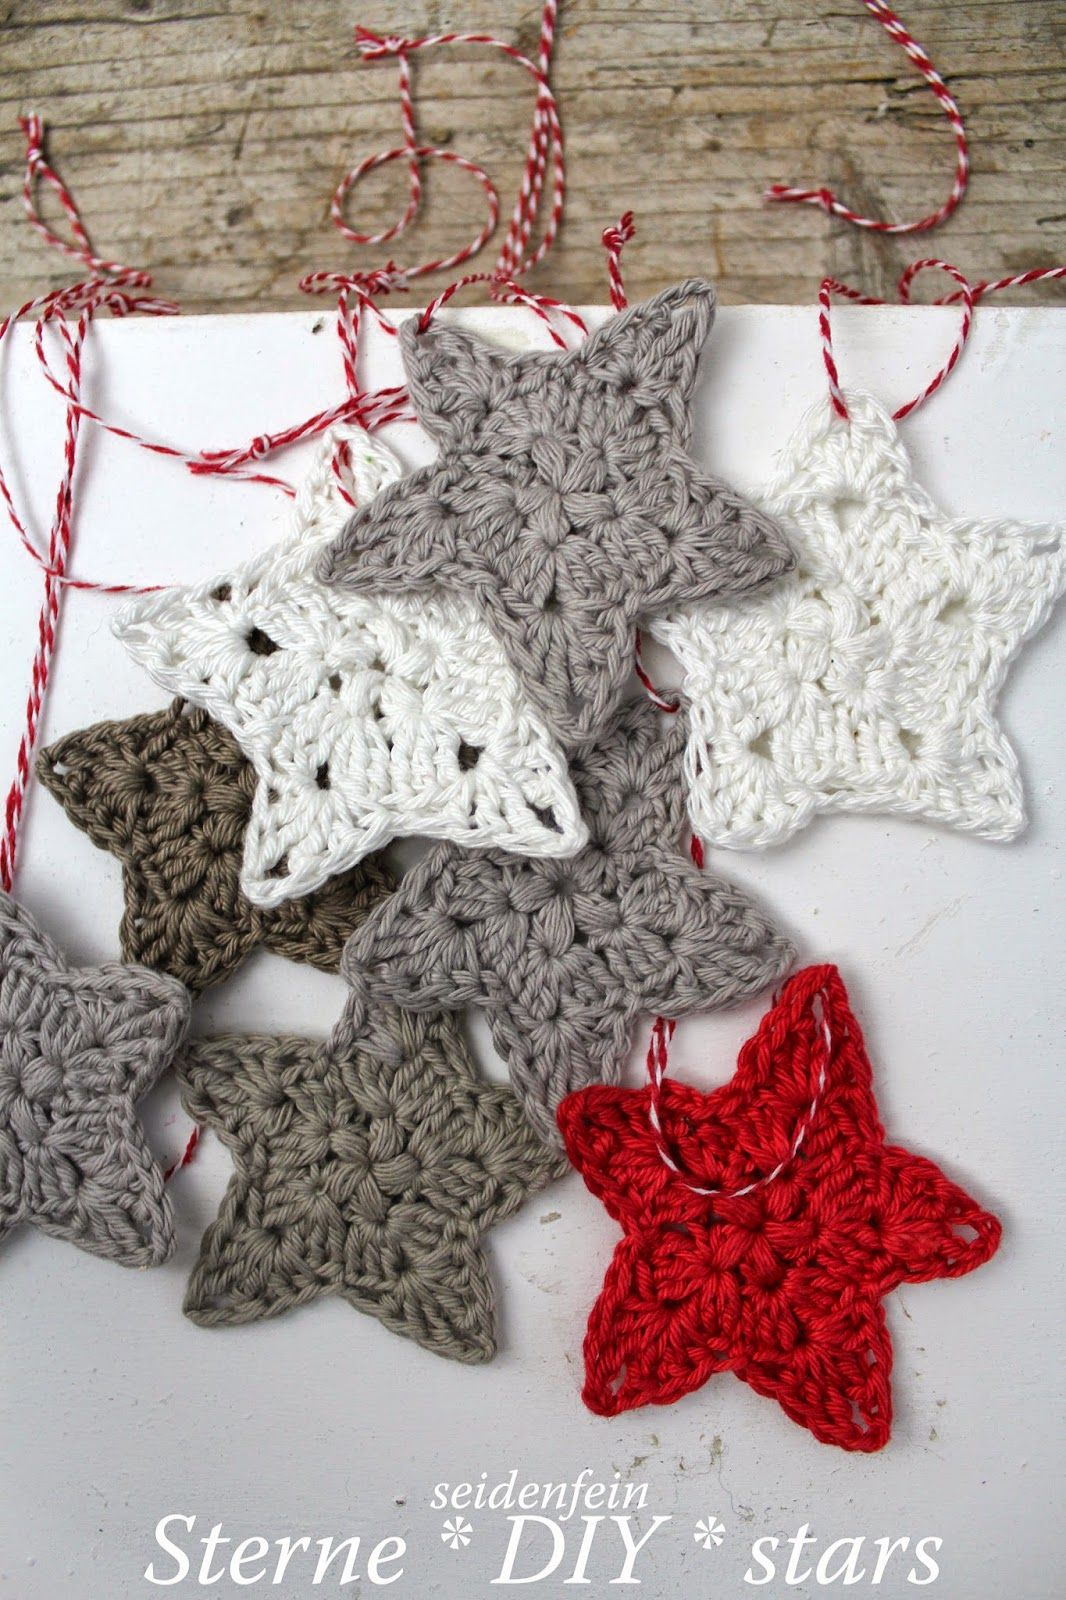 seidenfeins Dekoblog: 11 ✰ Sternchen-Anhänger * DIY * crochet some ...